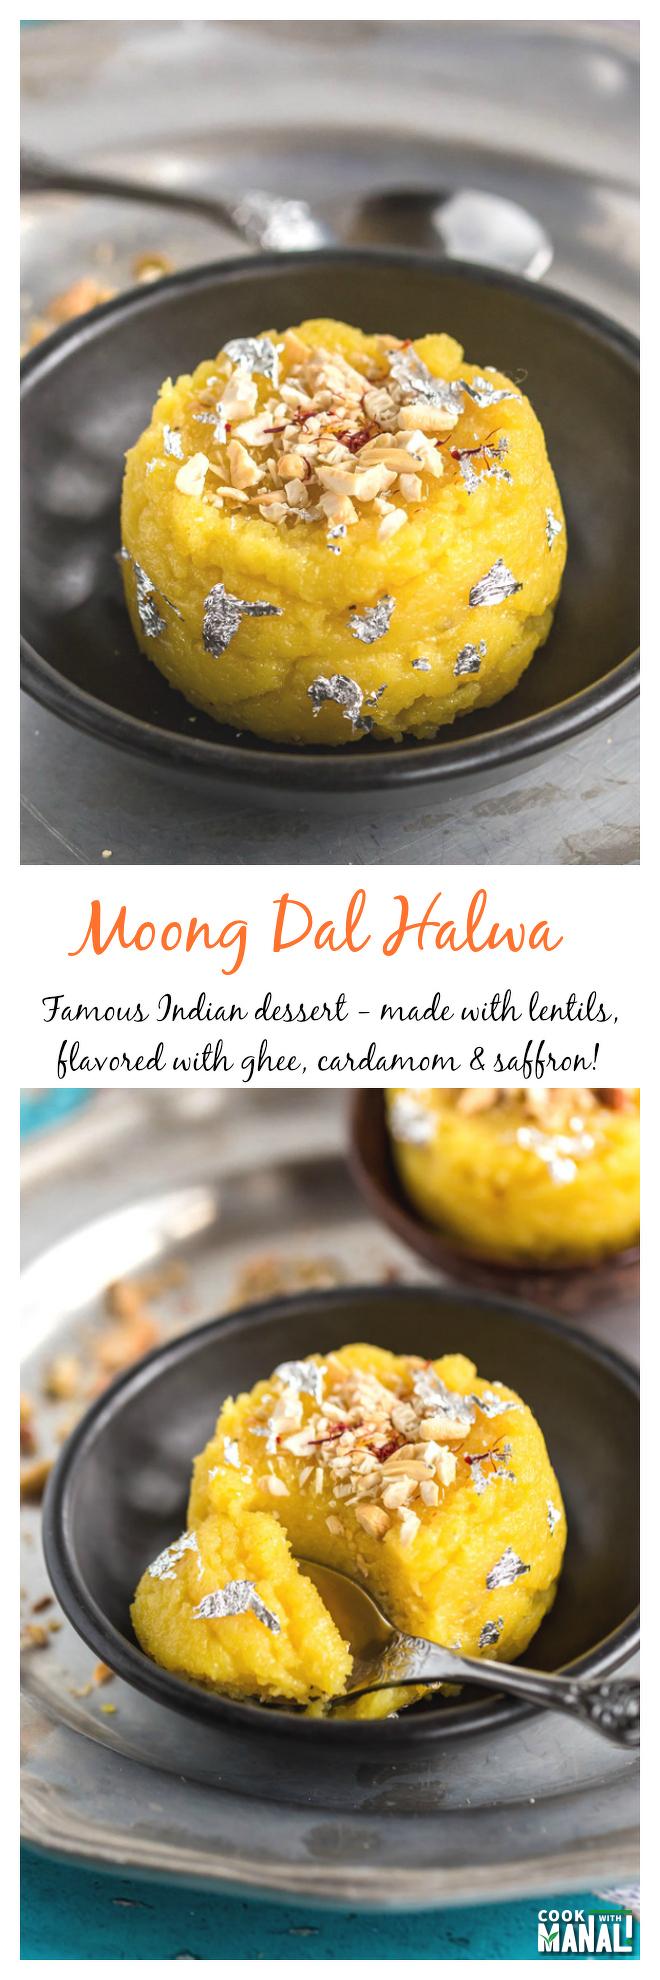 Moong Dal Halwa Collage